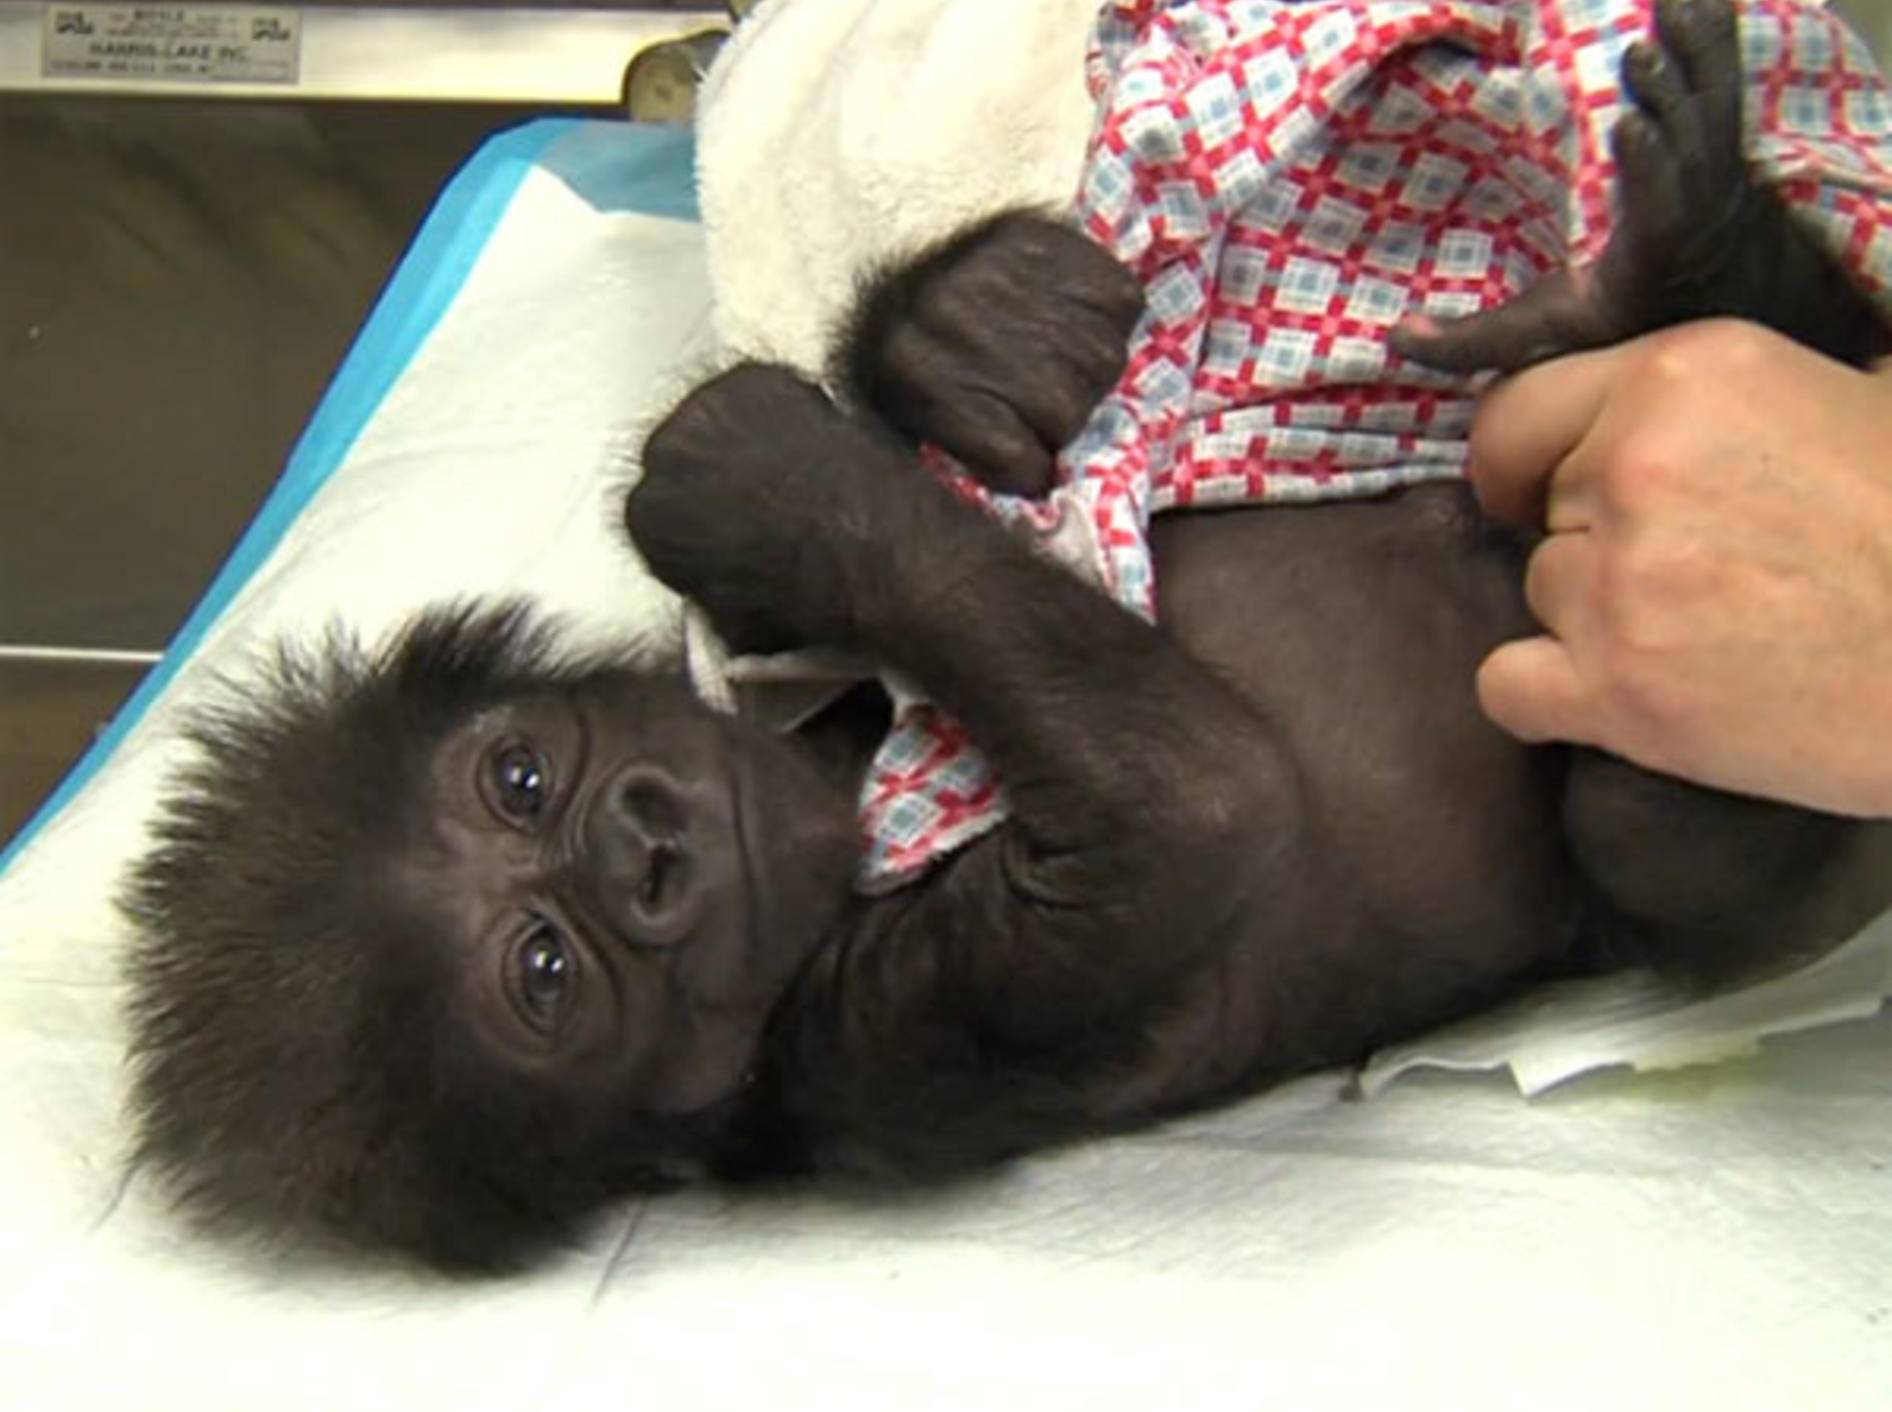 Gorilla-Baby-Affe-Zoo-Cincinnati